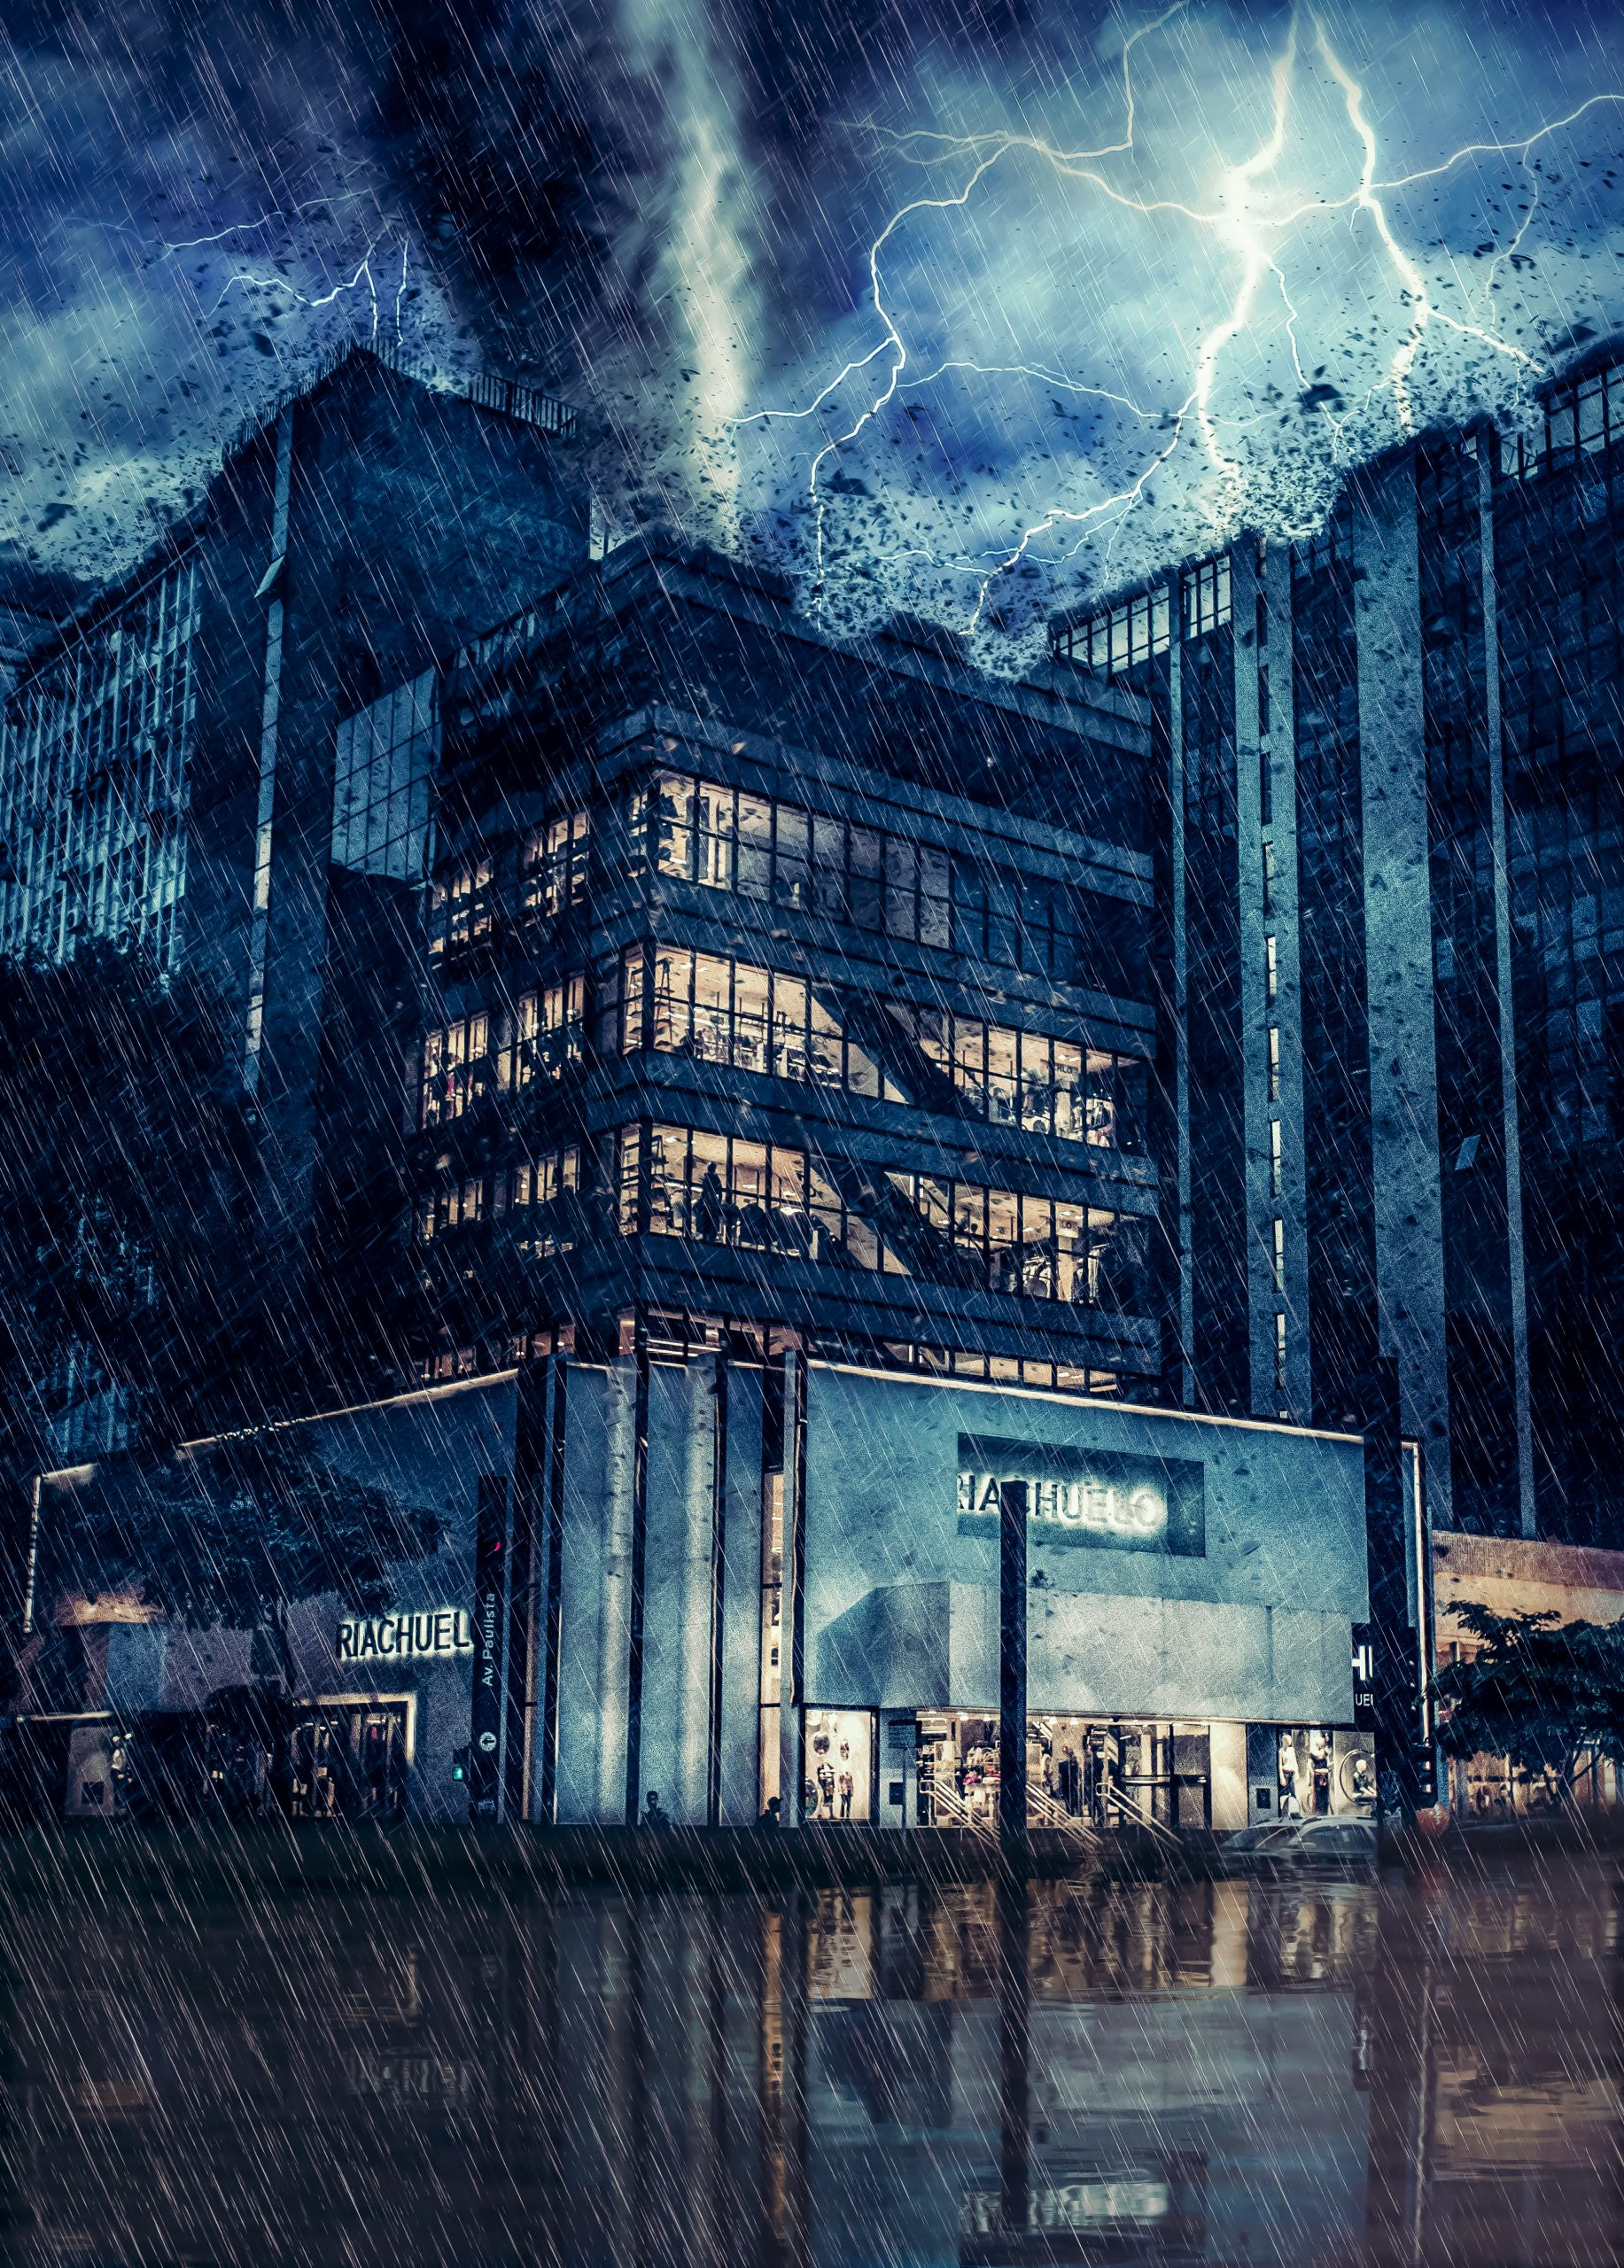 Rainy heavy storm on a building